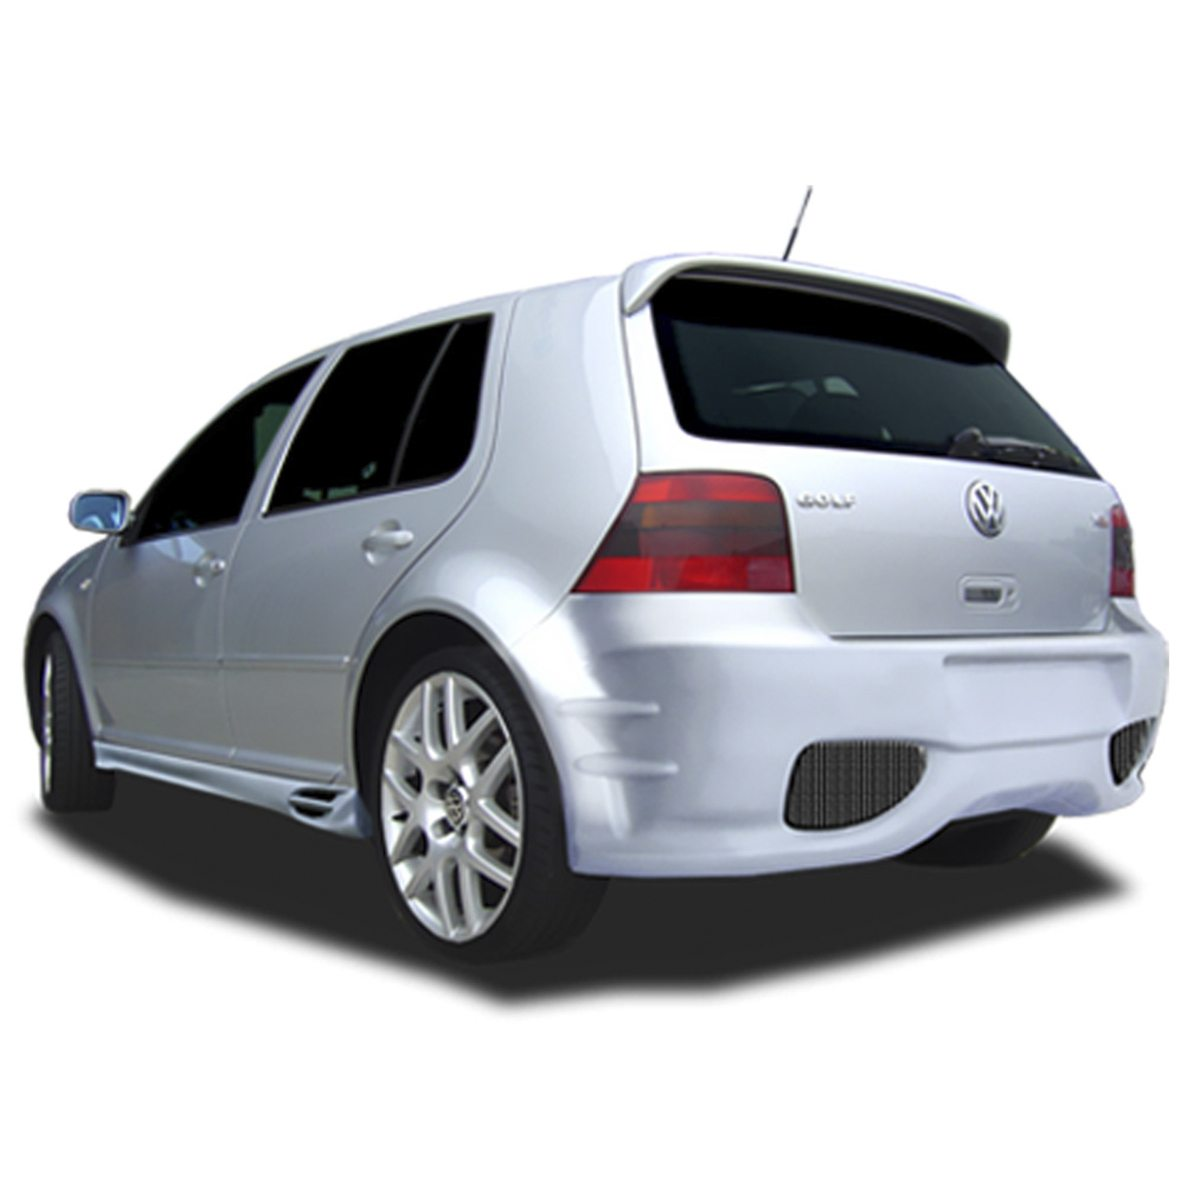 VW-Golf-IV-Swat-Tras-PCU1091